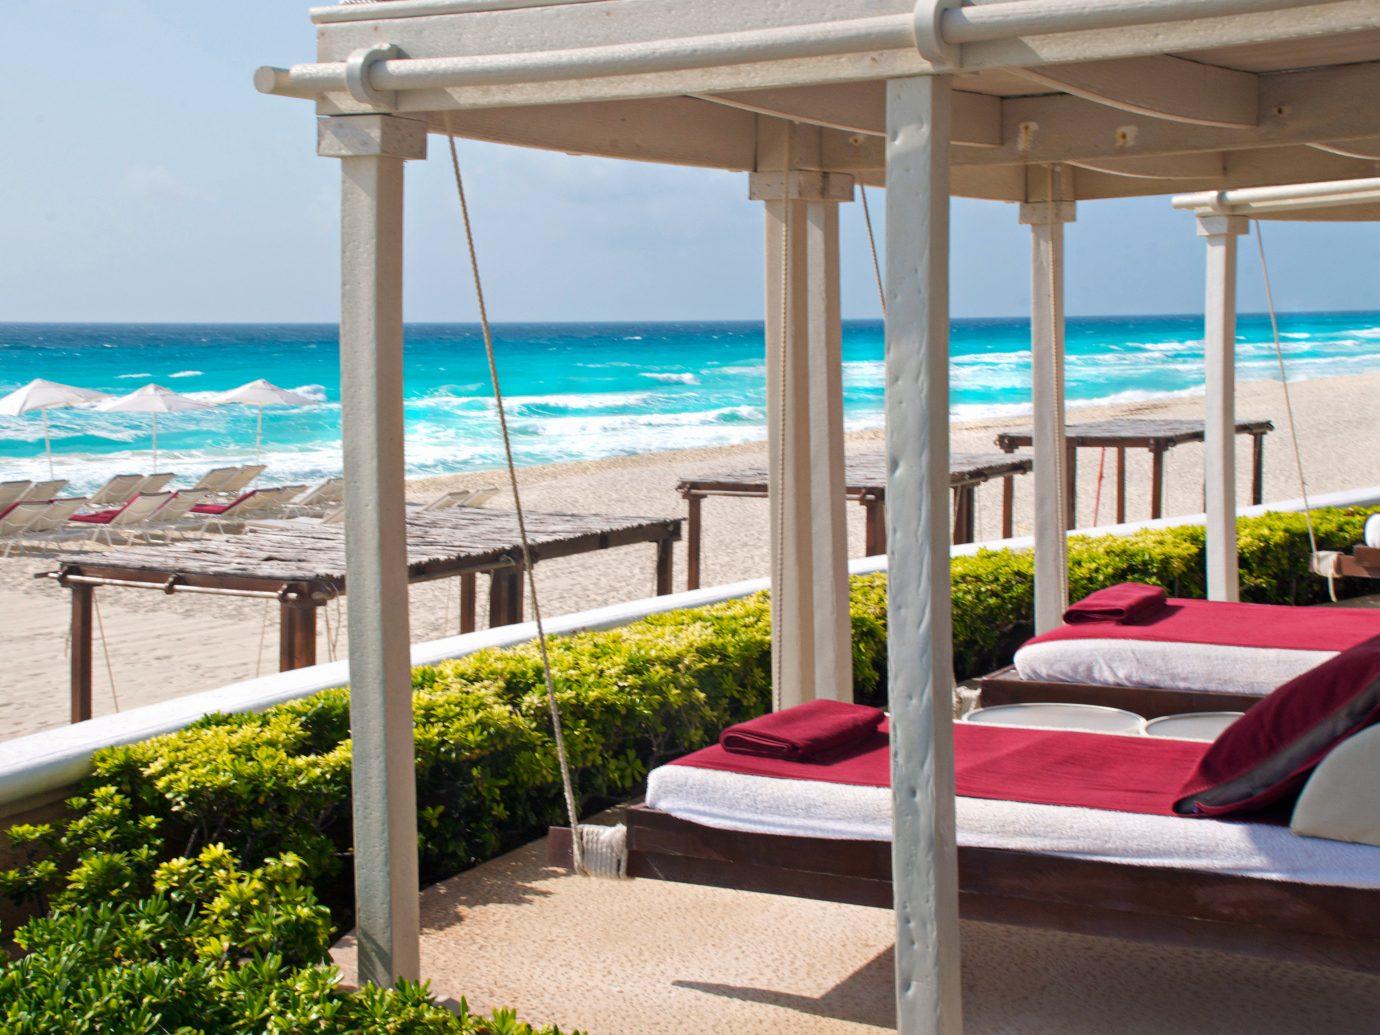 Beach Beachfront Lounge Luxury Ocean Trip Ideas outdoor chair umbrella property leisure lawn vacation Resort caribbean estate Villa real estate overlooking Pool Deck furniture shade shore day